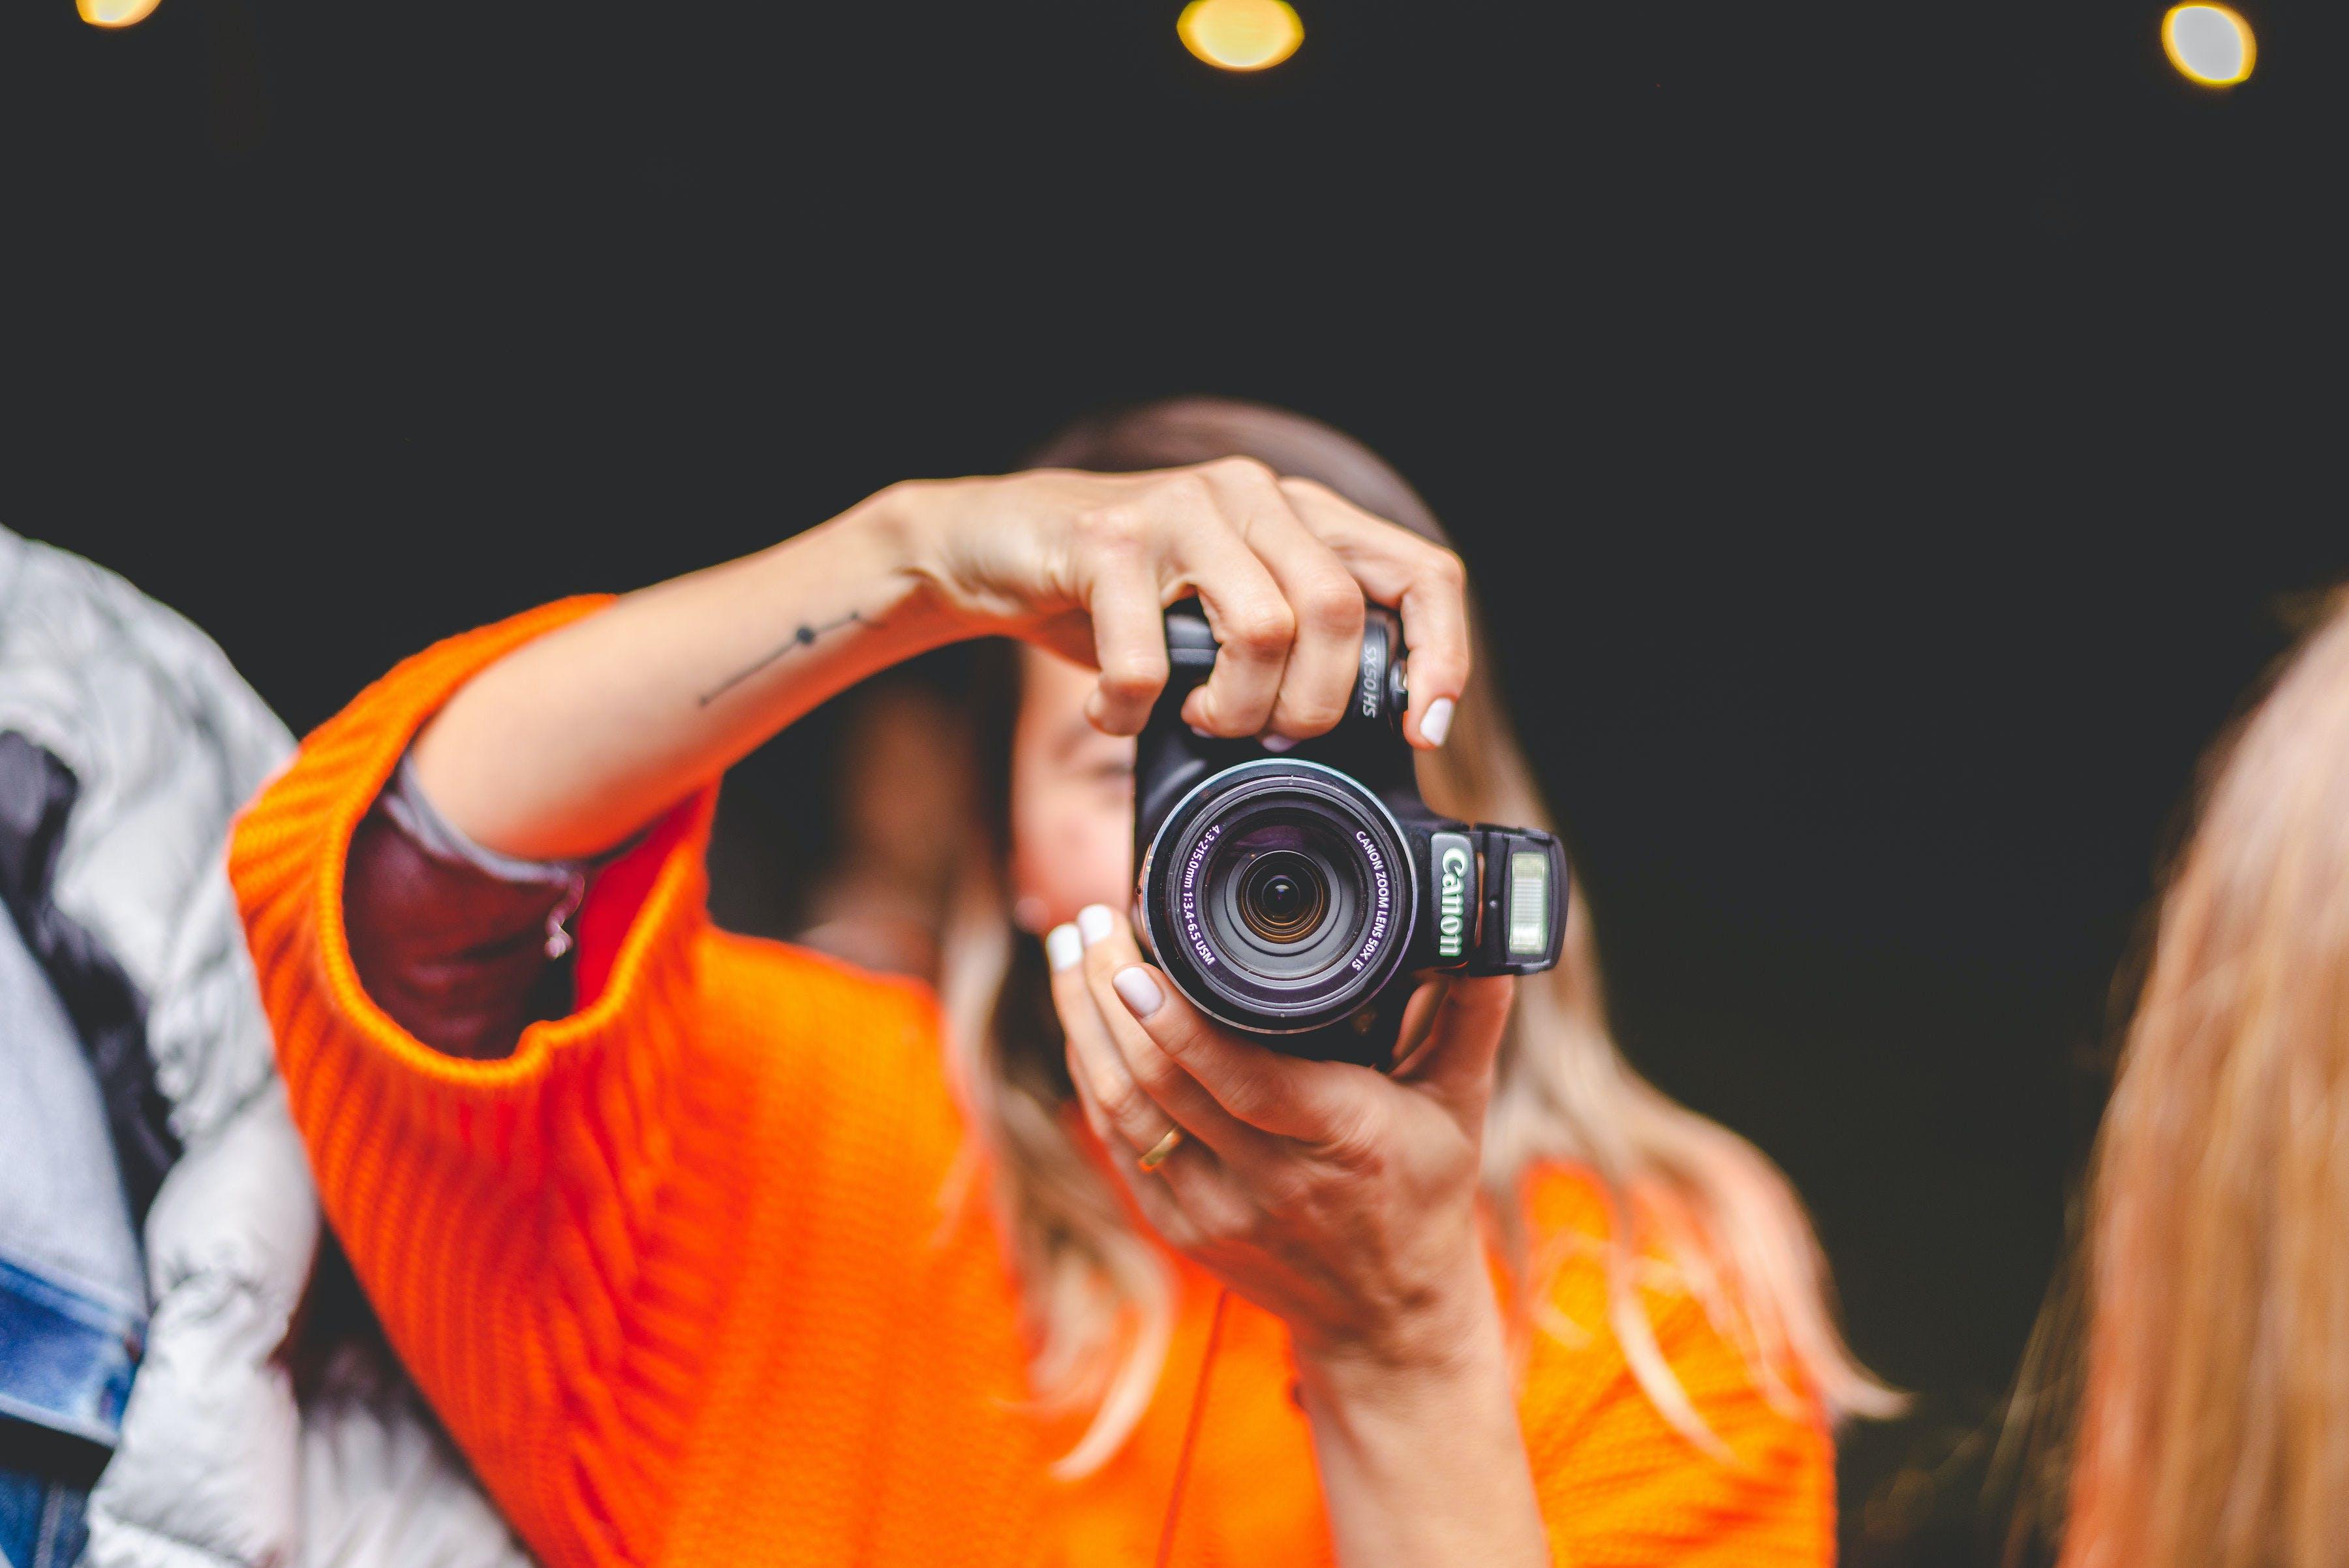 Fotos de stock gratuitas de al aire libre, cámara, Canon, color